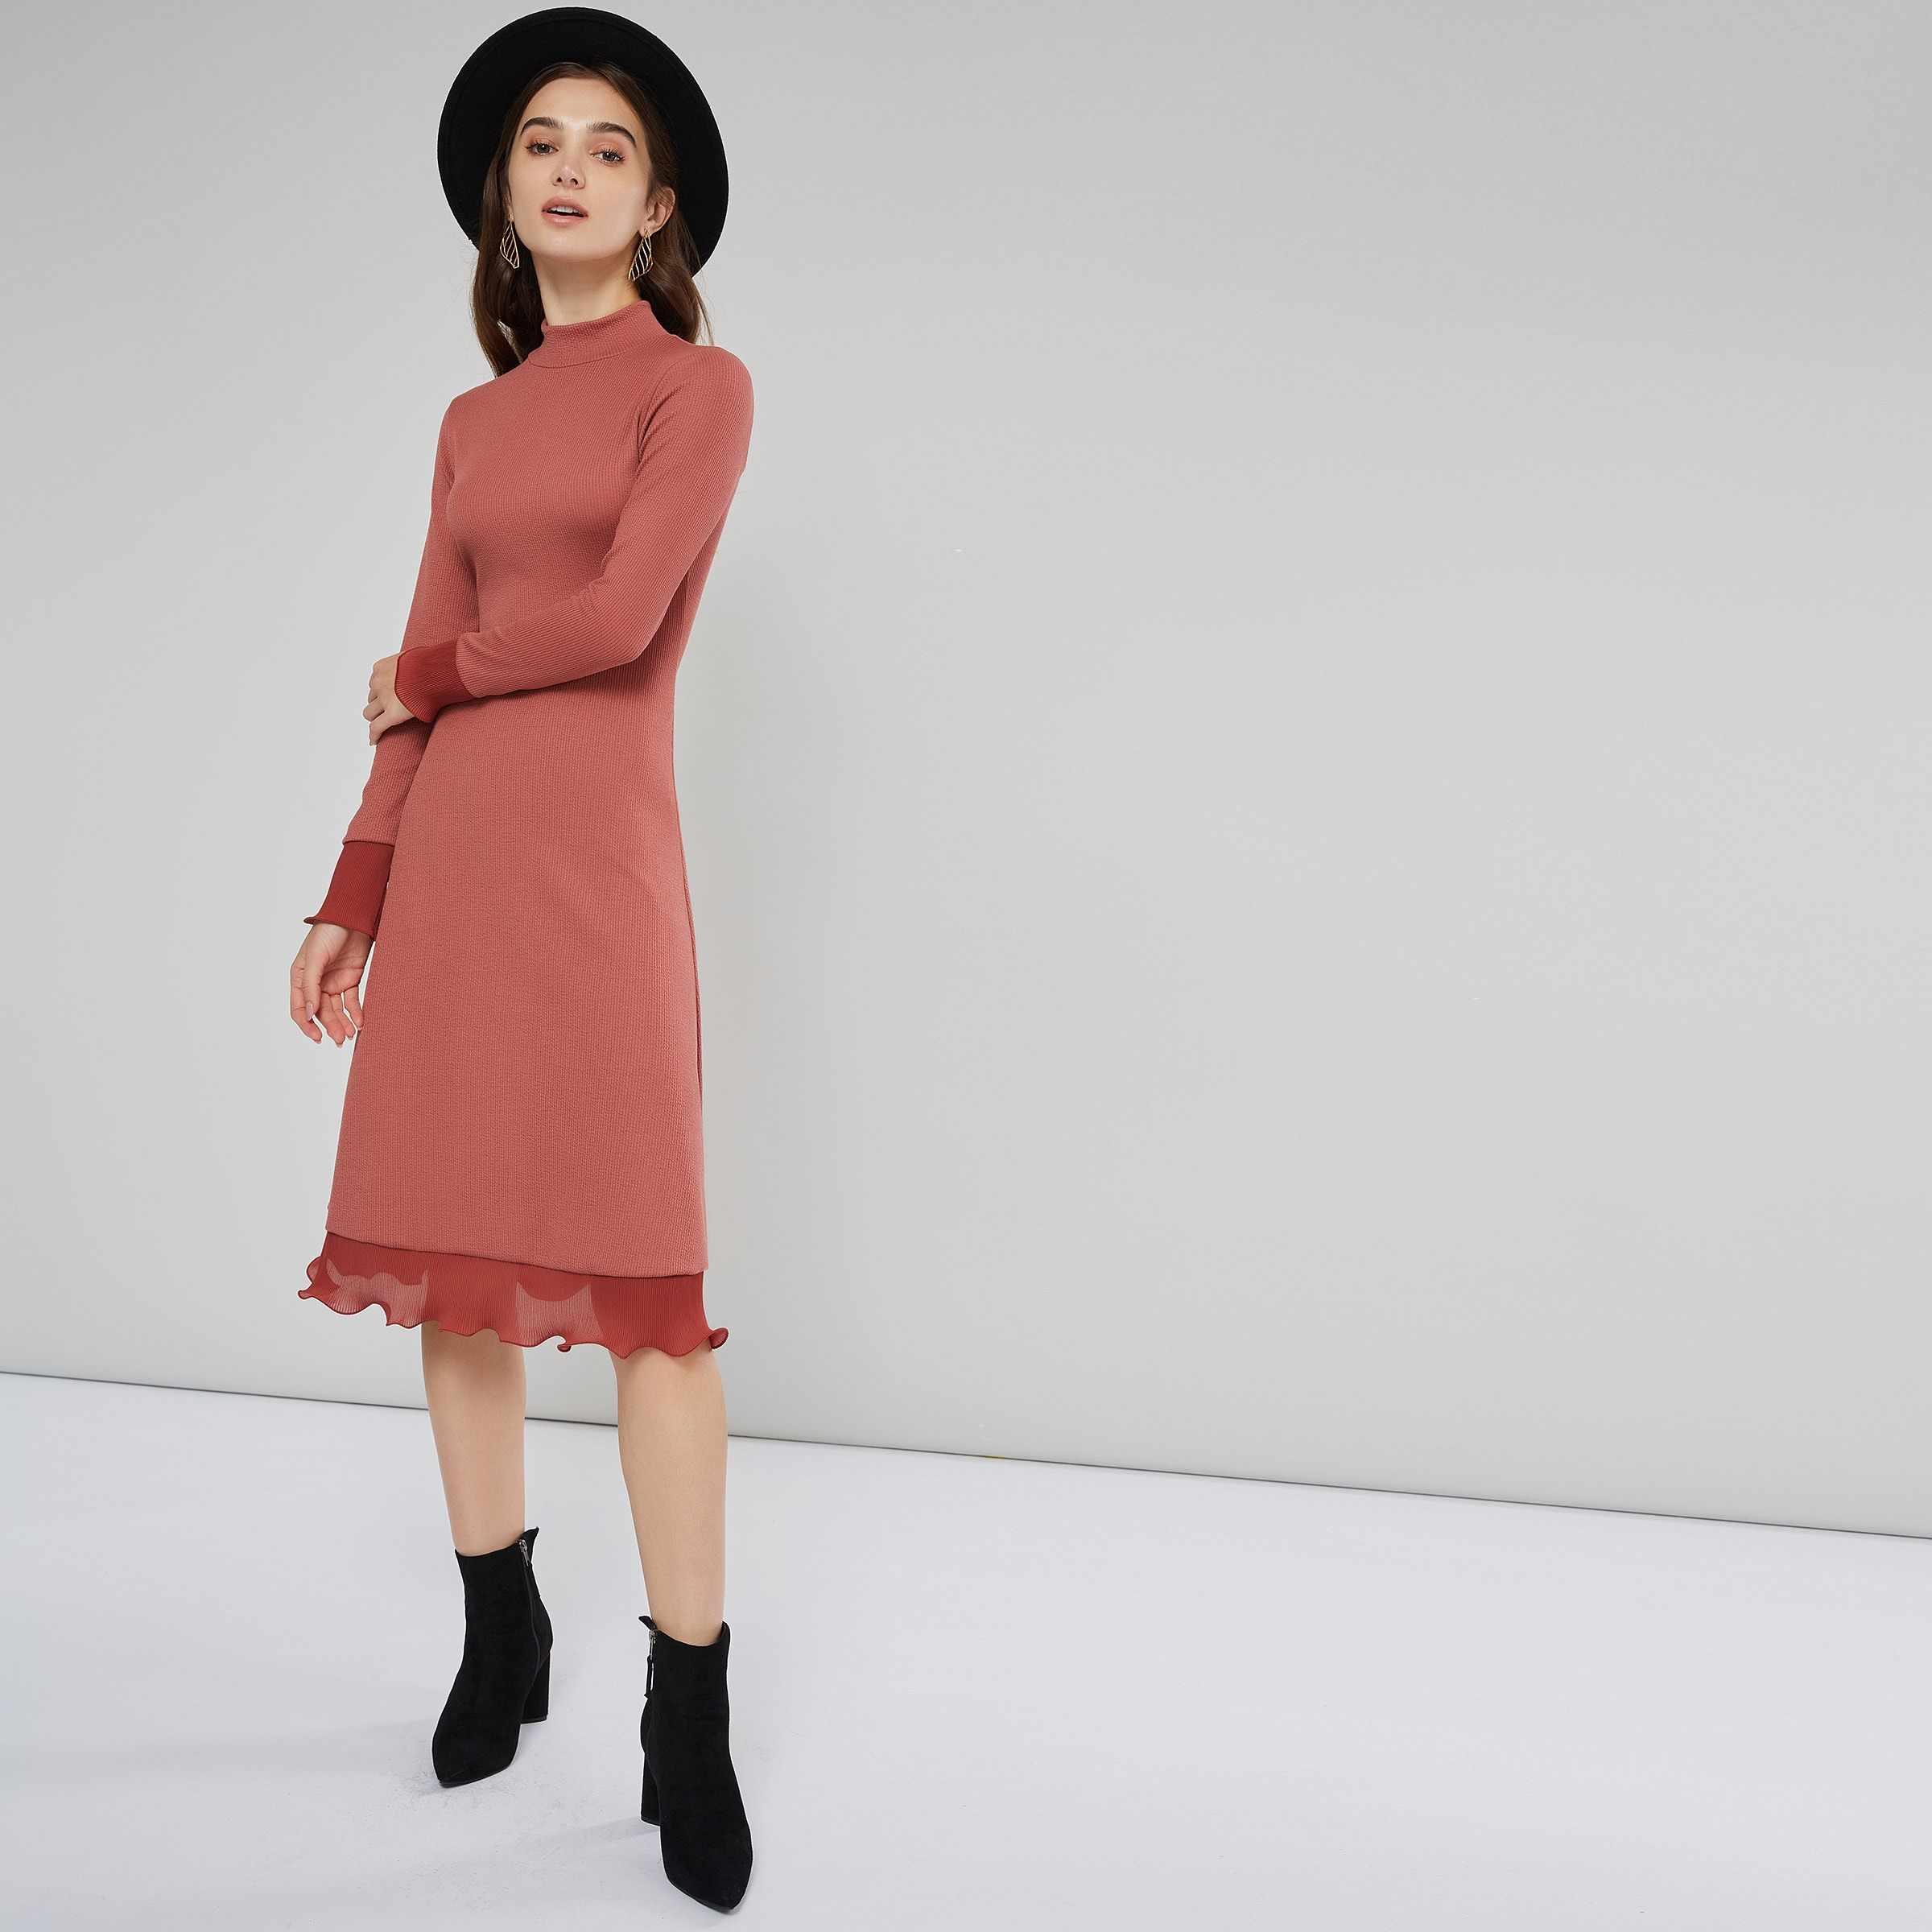 030aaedbd2f7f28 ... Sisjuly для женщин вечеринка Винтаж весна зима темно розовый вязаное  платье рюшами с длинным рукавом Лепесток ...